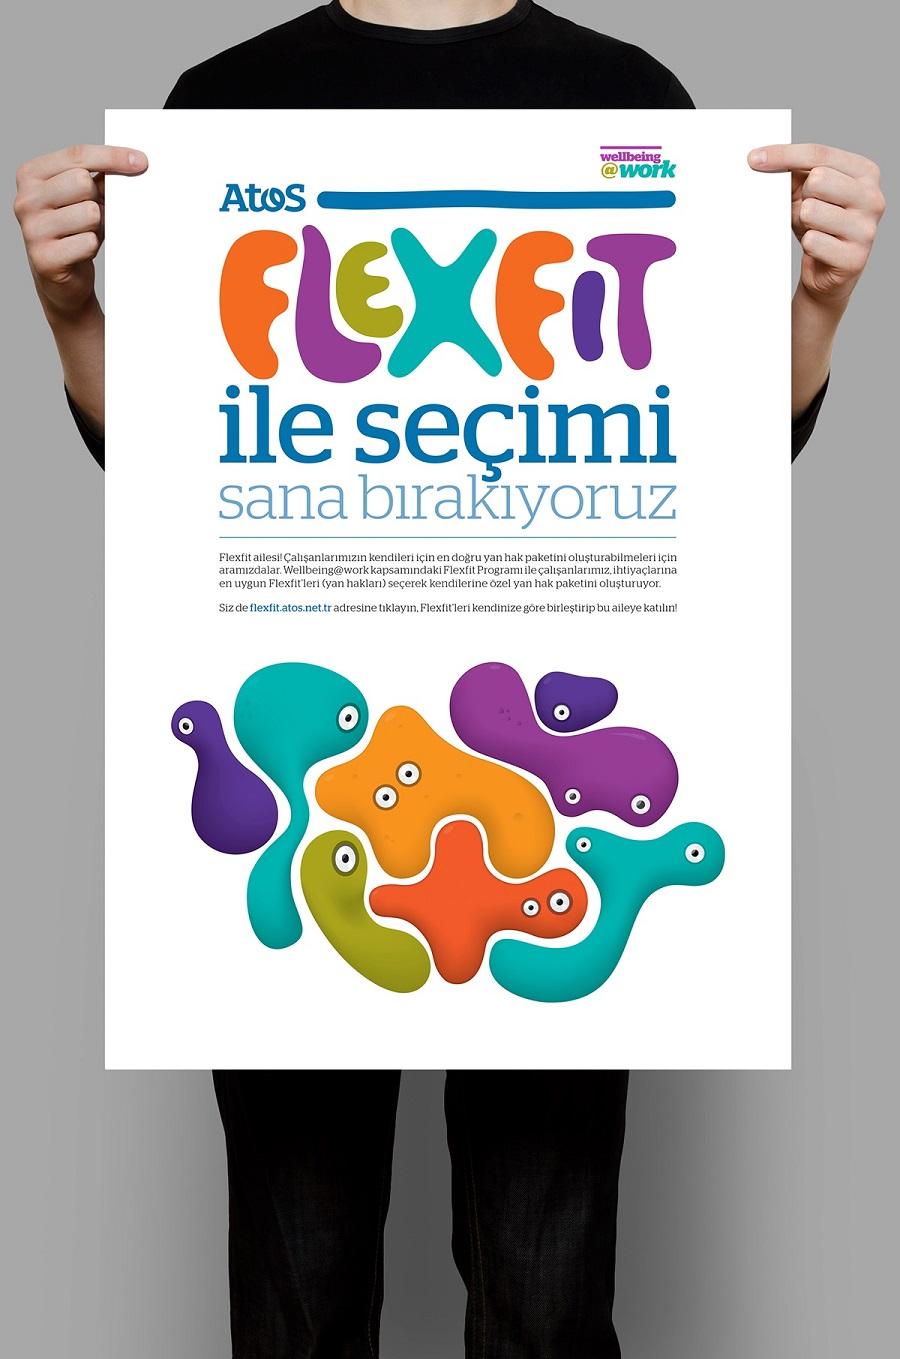 Atos flexfit 6.jpg